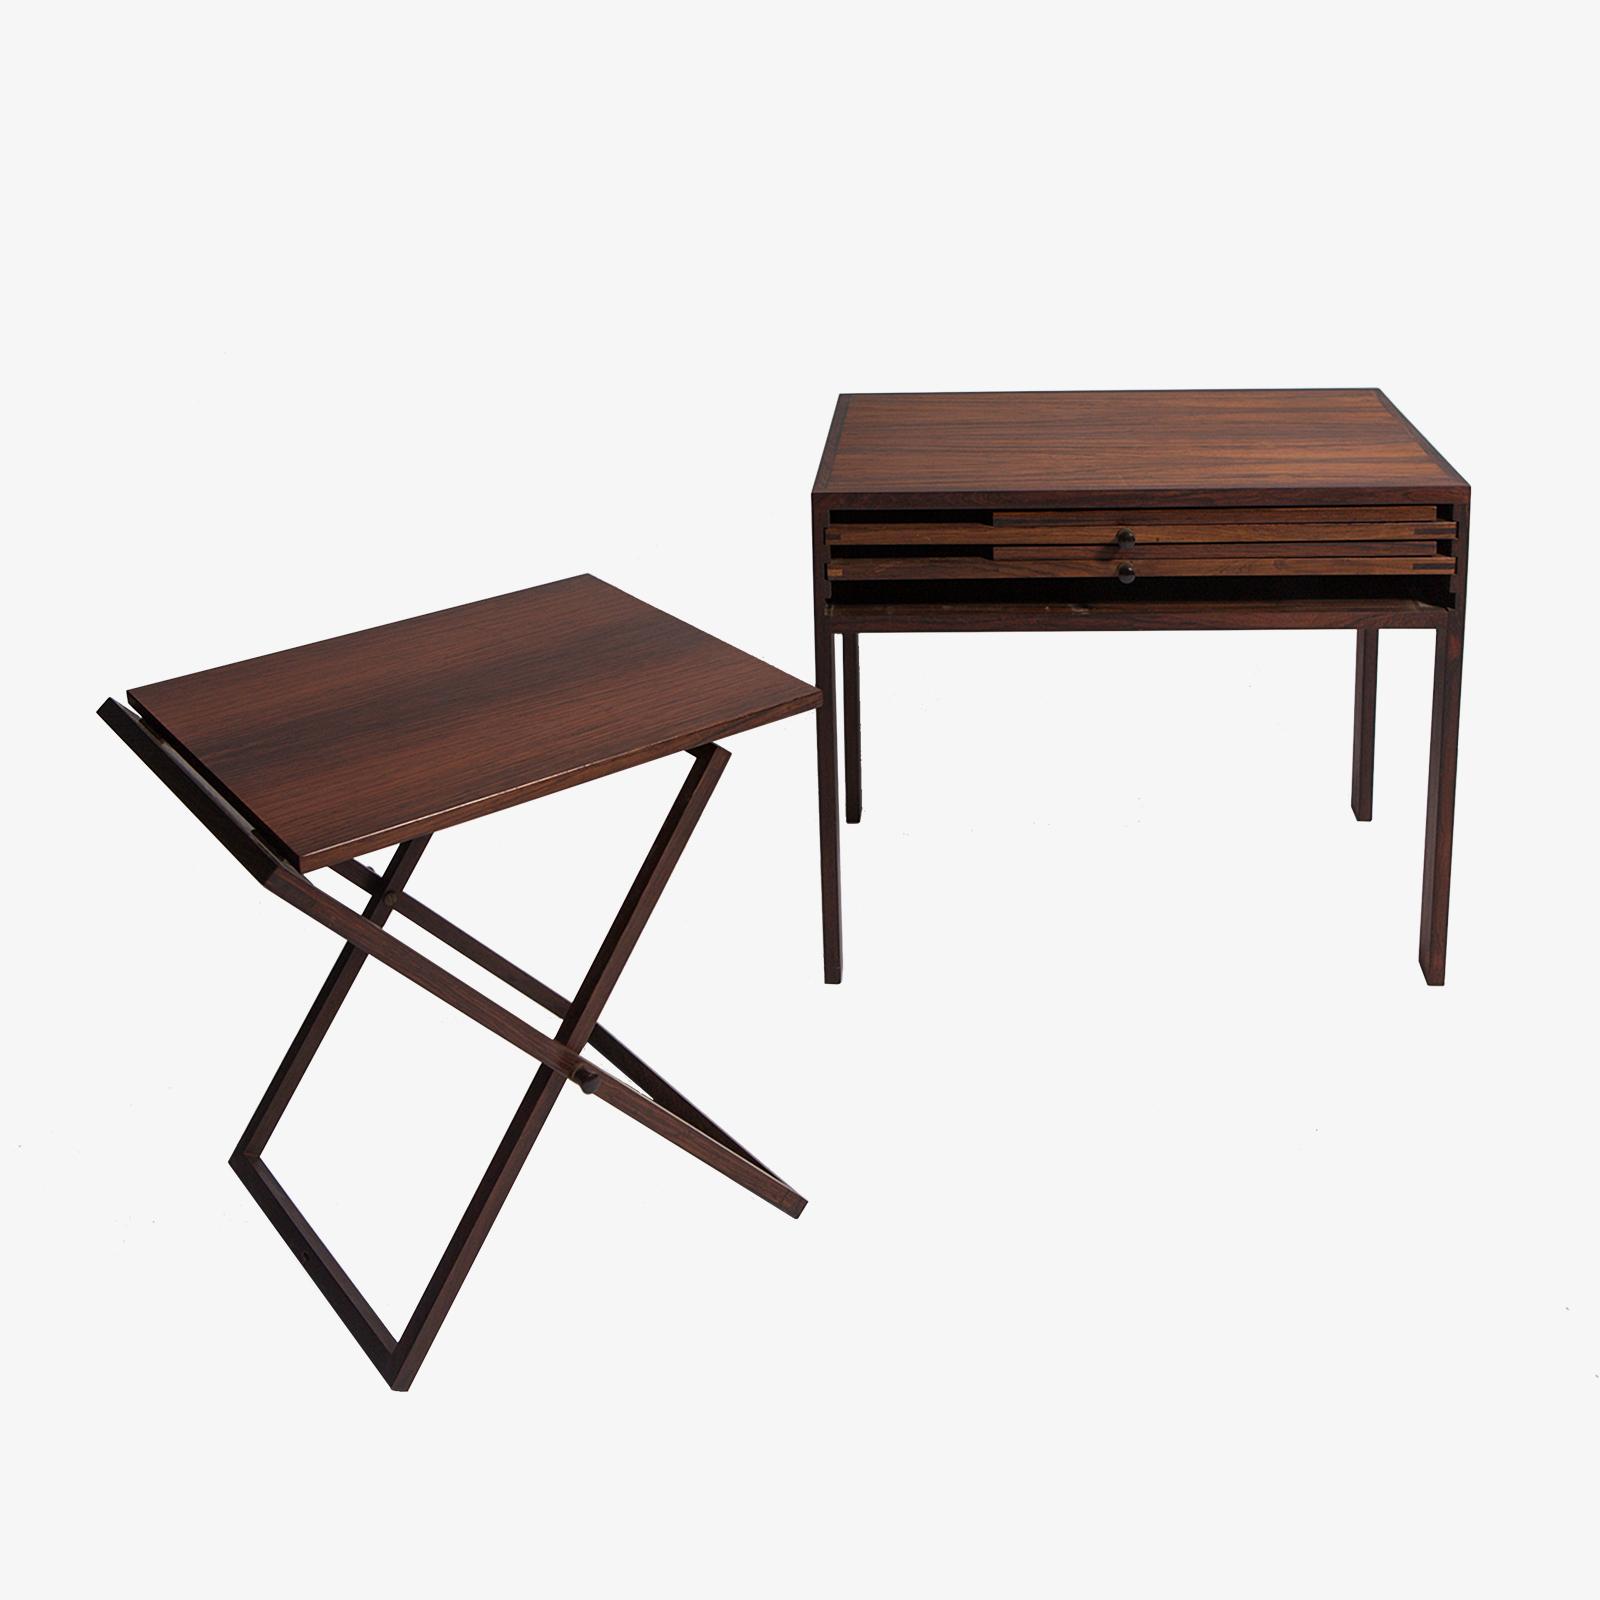 regenerationfurniture_291_illumwikkelsosilkborg_set_of_three_folding_tables_stored_in_side_table_denmark_1960s_rosewood_brass_metal_manufacturer_label_01